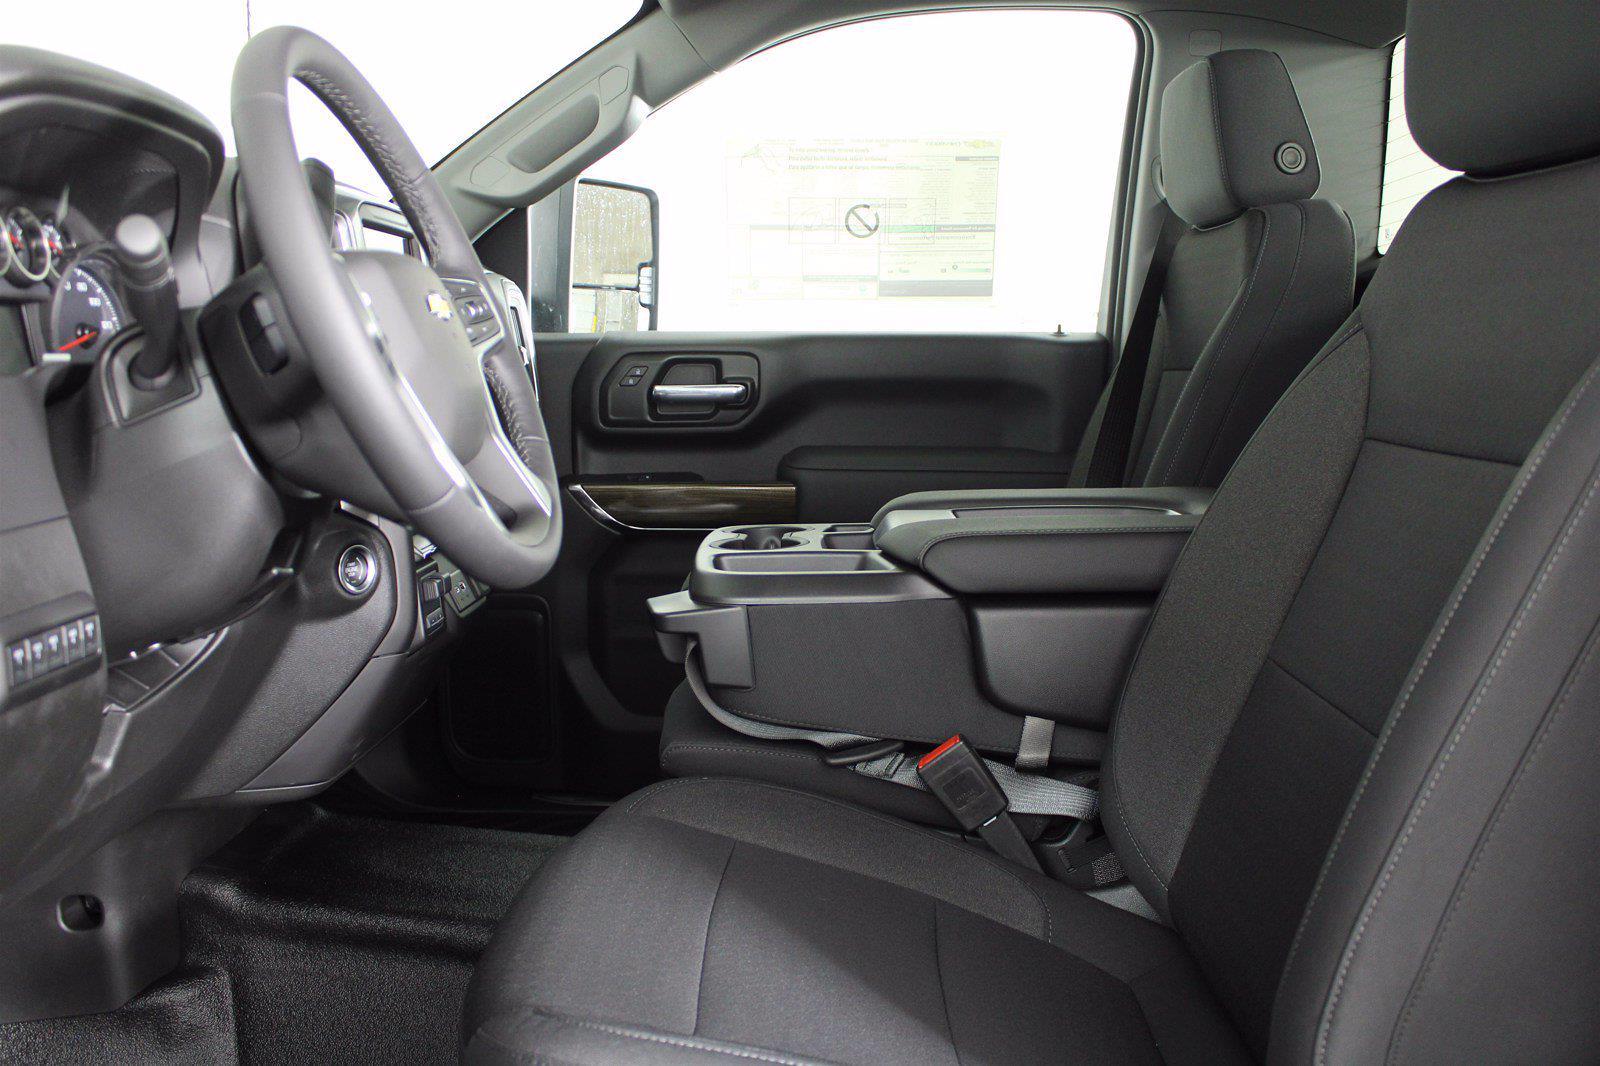 2022 Silverado 2500 Regular Cab 4x4,  Pickup #D120020 - photo 15